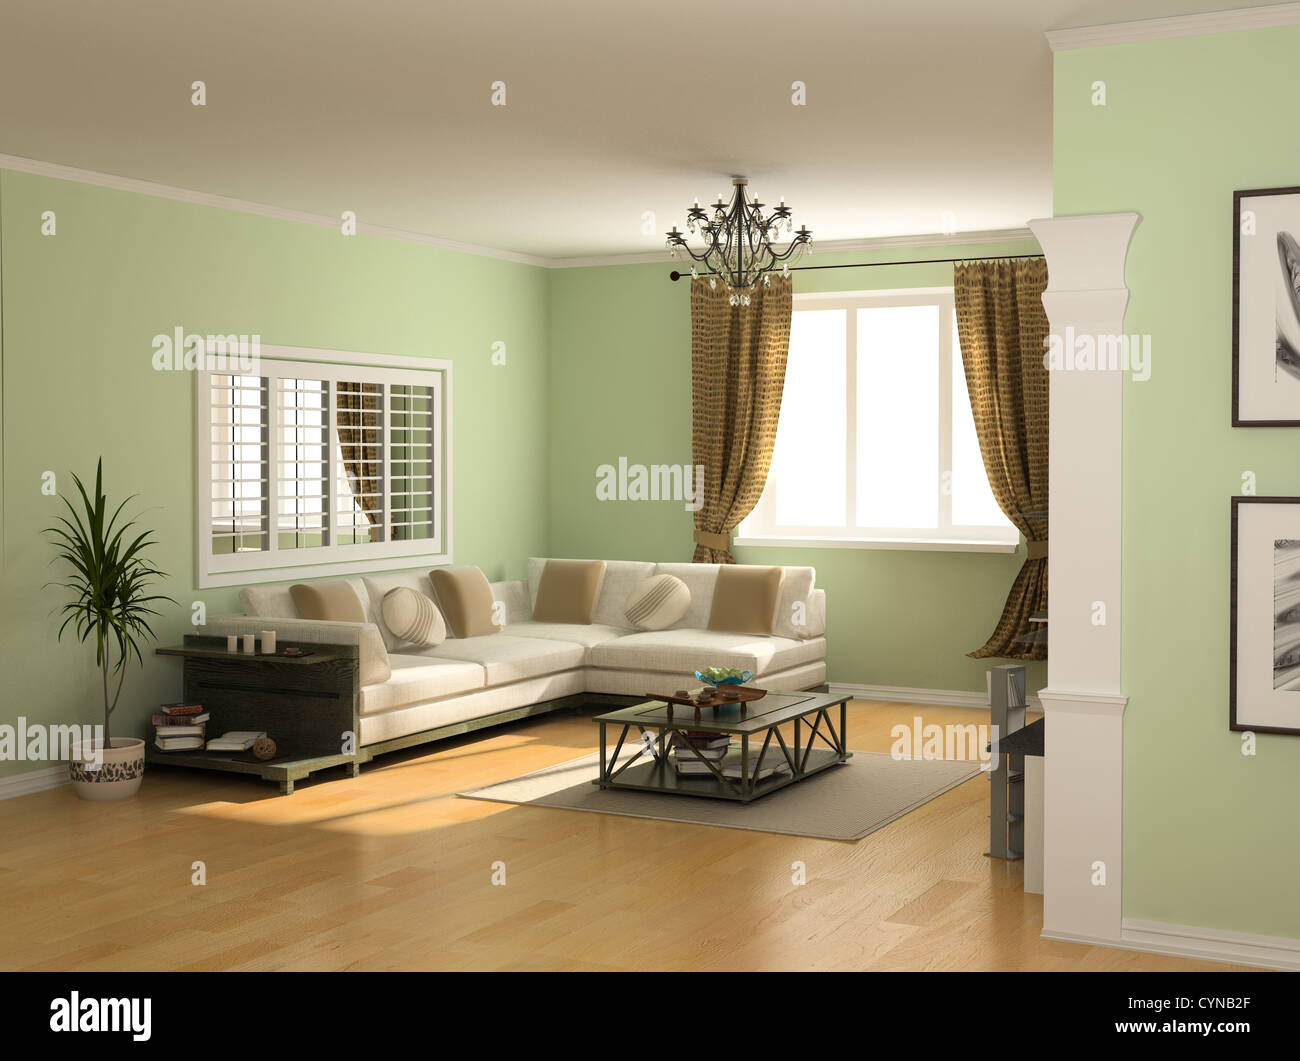 Diseño de interiores moderno apartamento privado (3d) Imagen De Stock